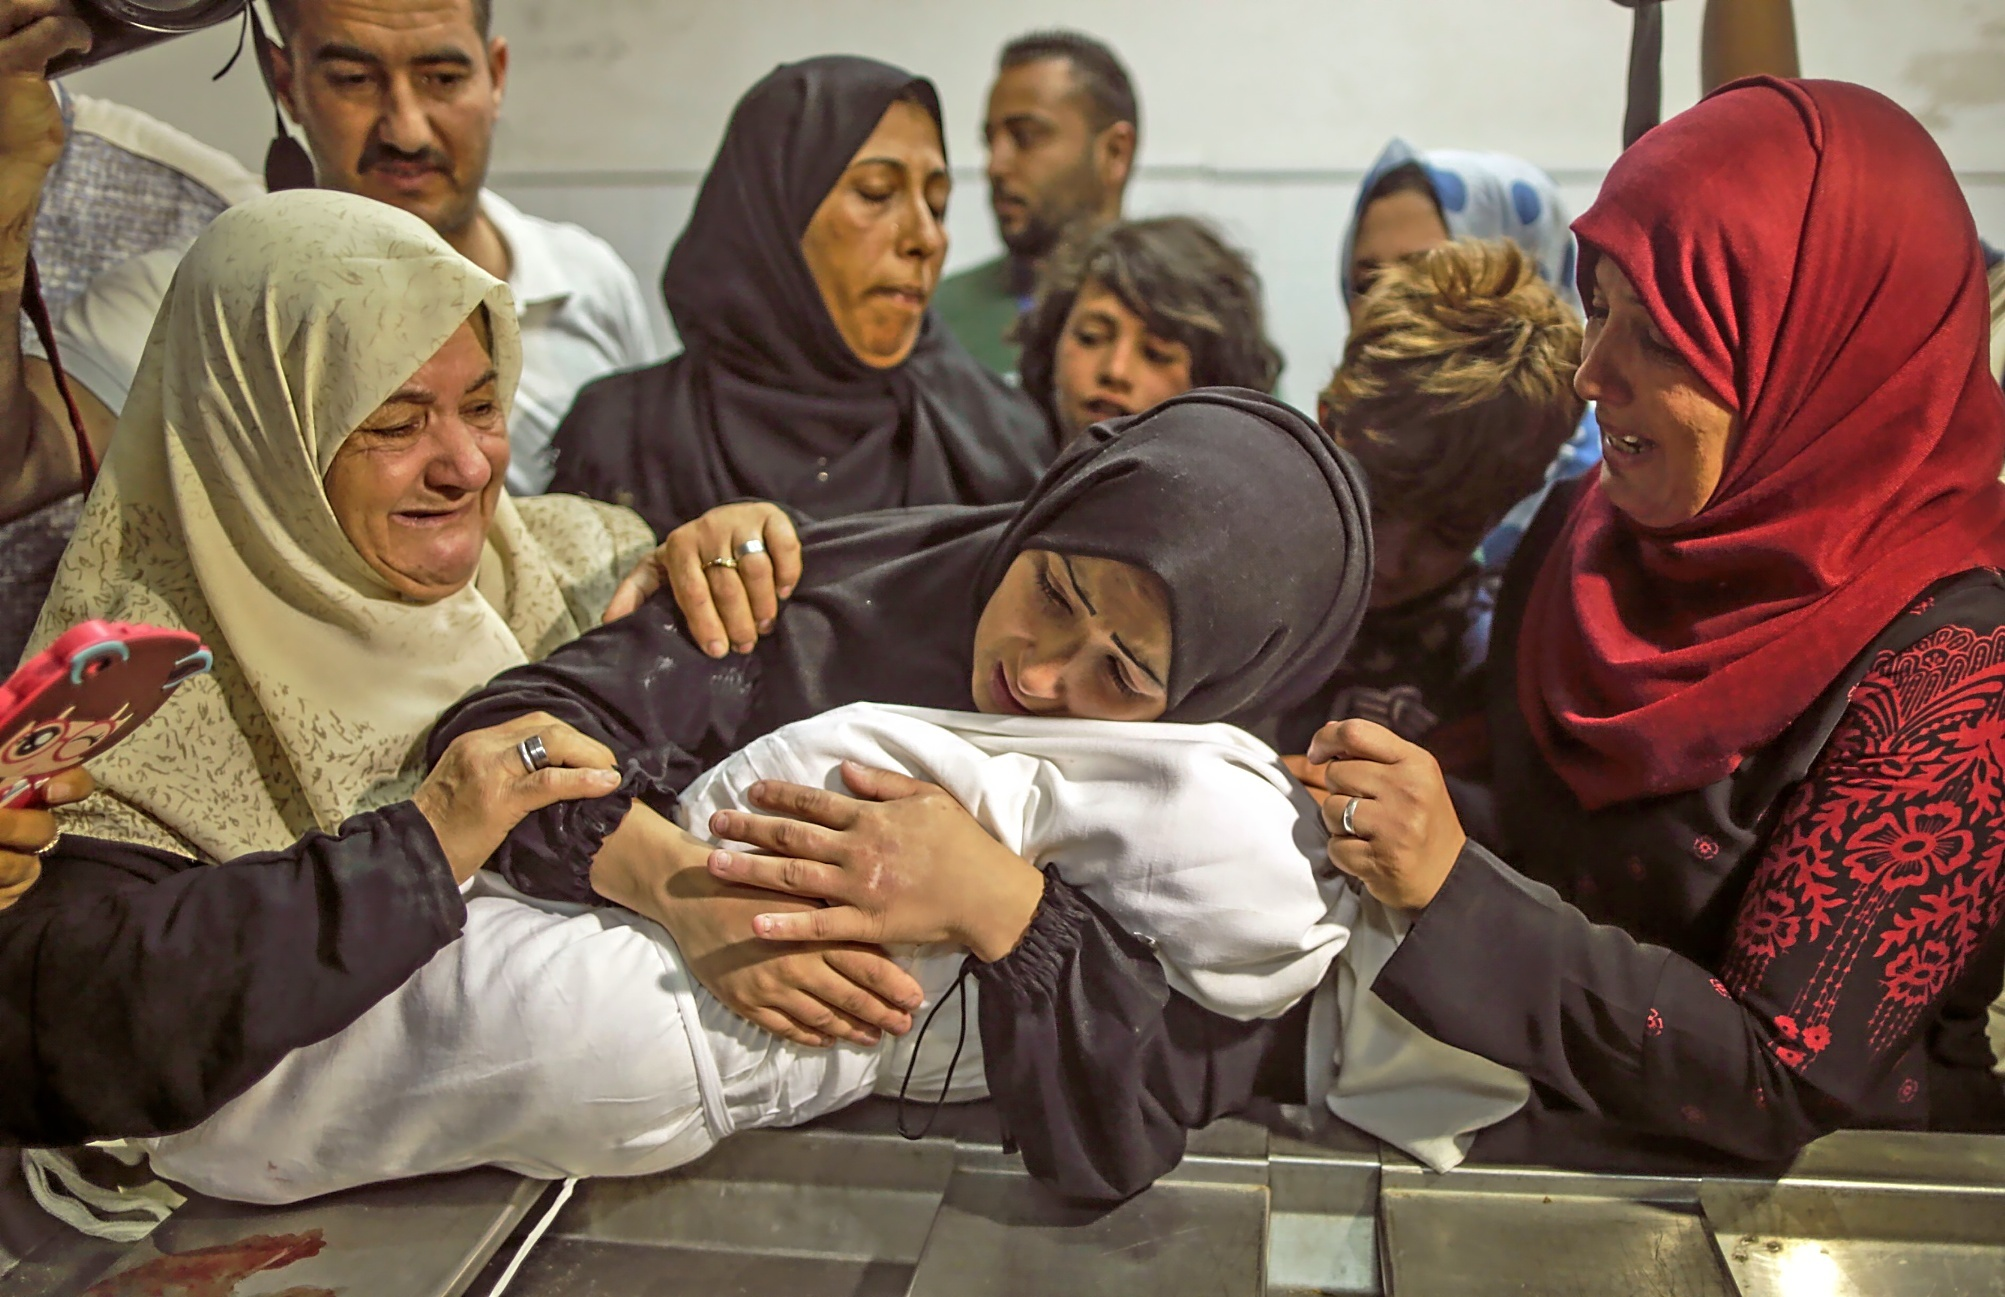 Las protestas de la Nakba transcurrieron con relativa calma tras